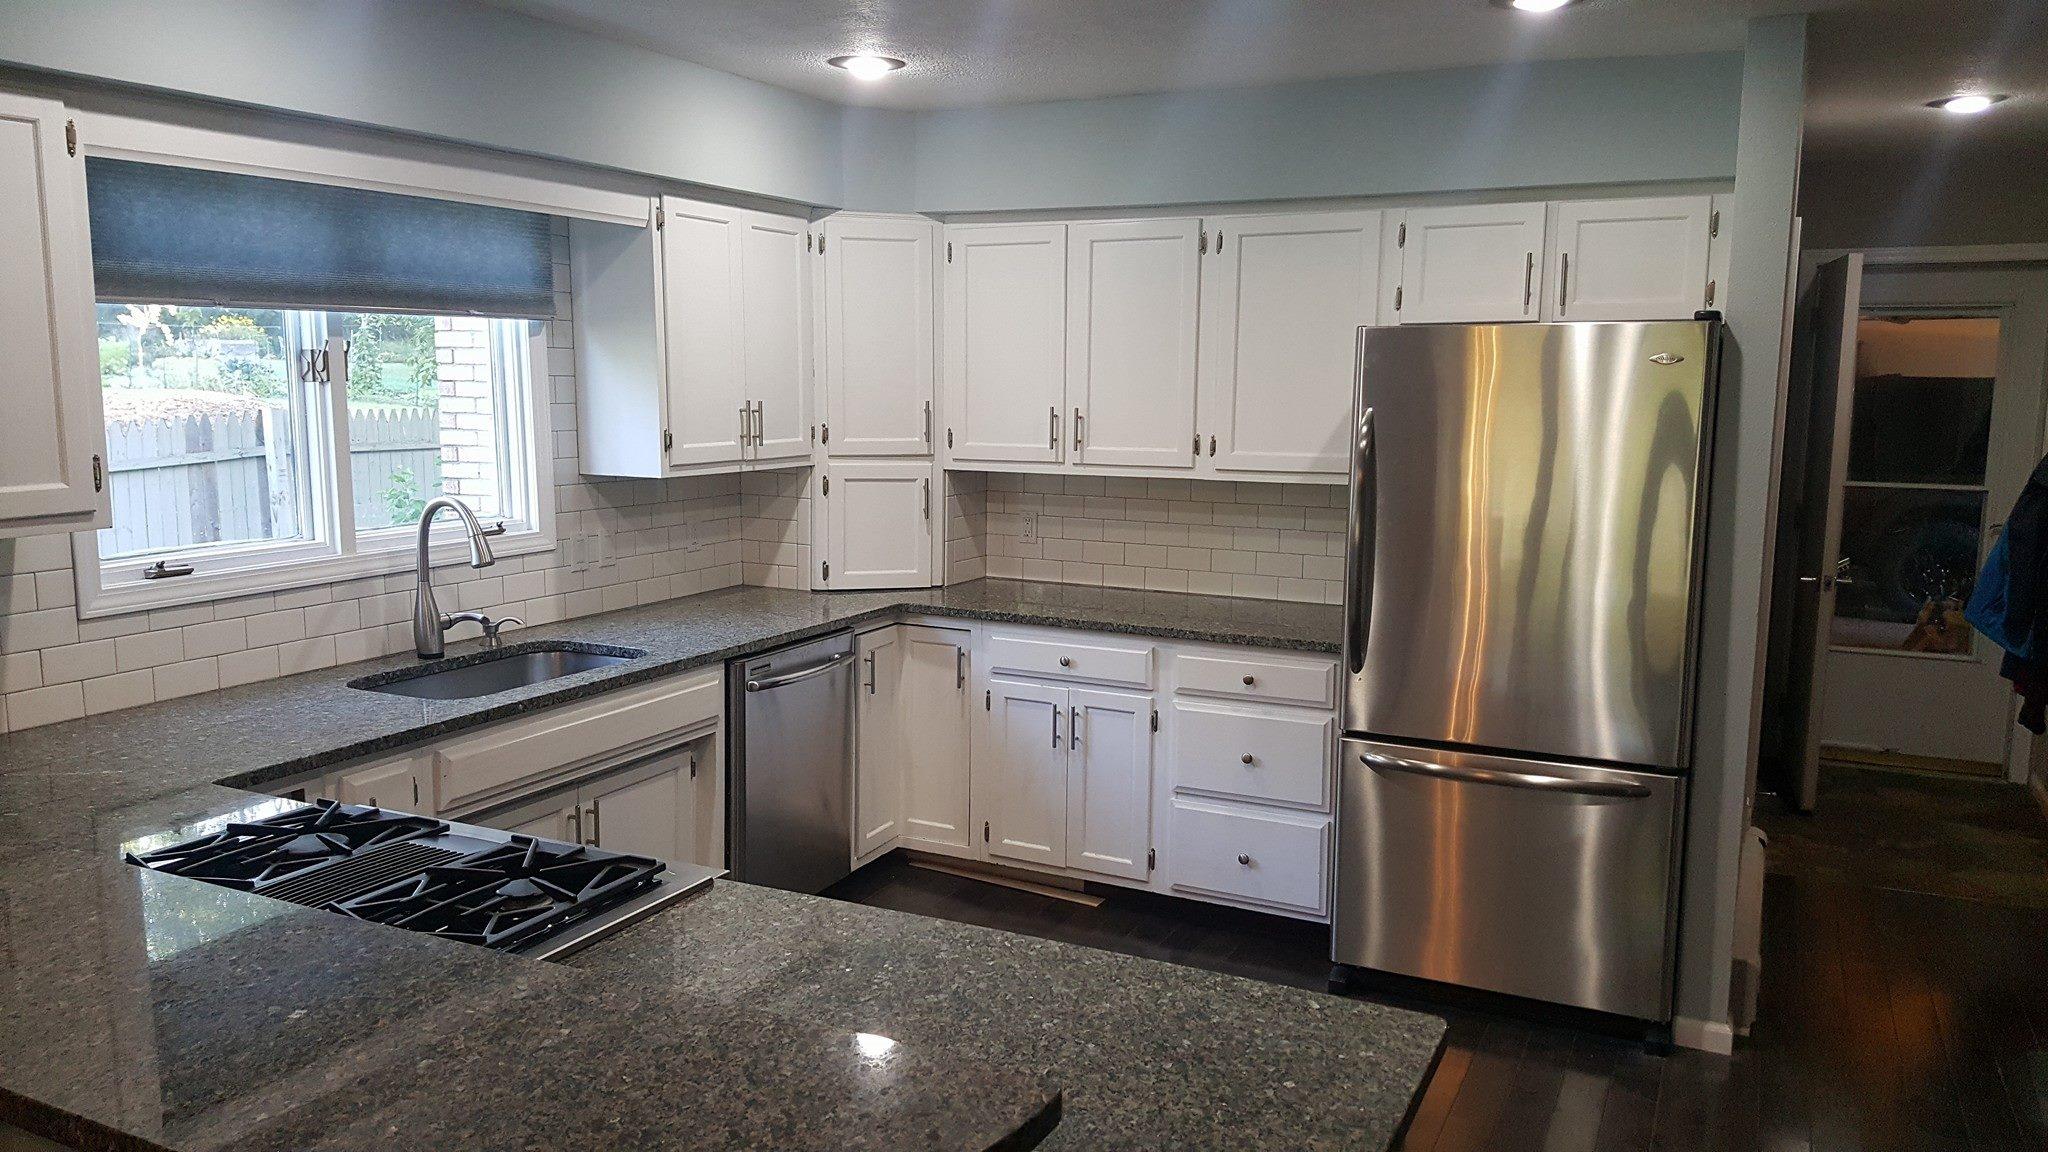 Clarkston Kitchen Renovation BEFORE